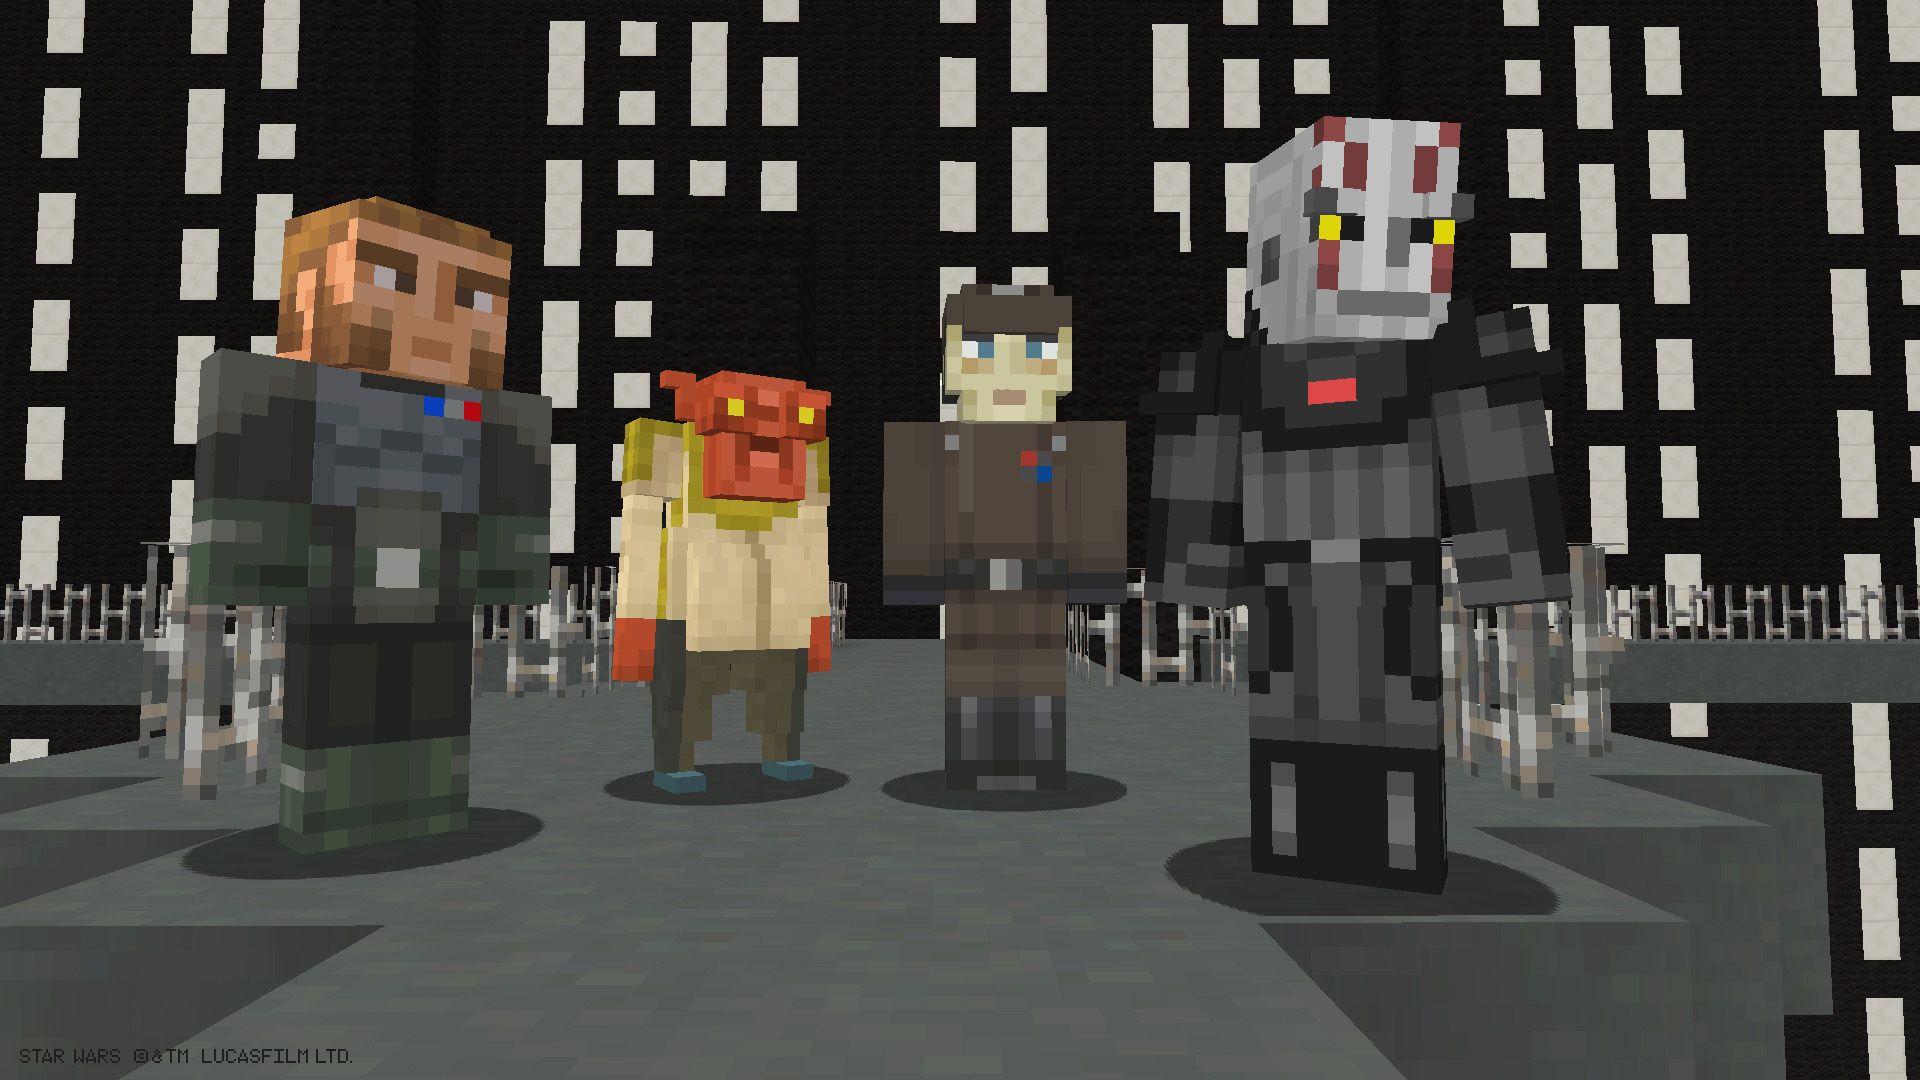 11 Awesome Star Wars Minecraft Creations  StarWars.com  Star wars